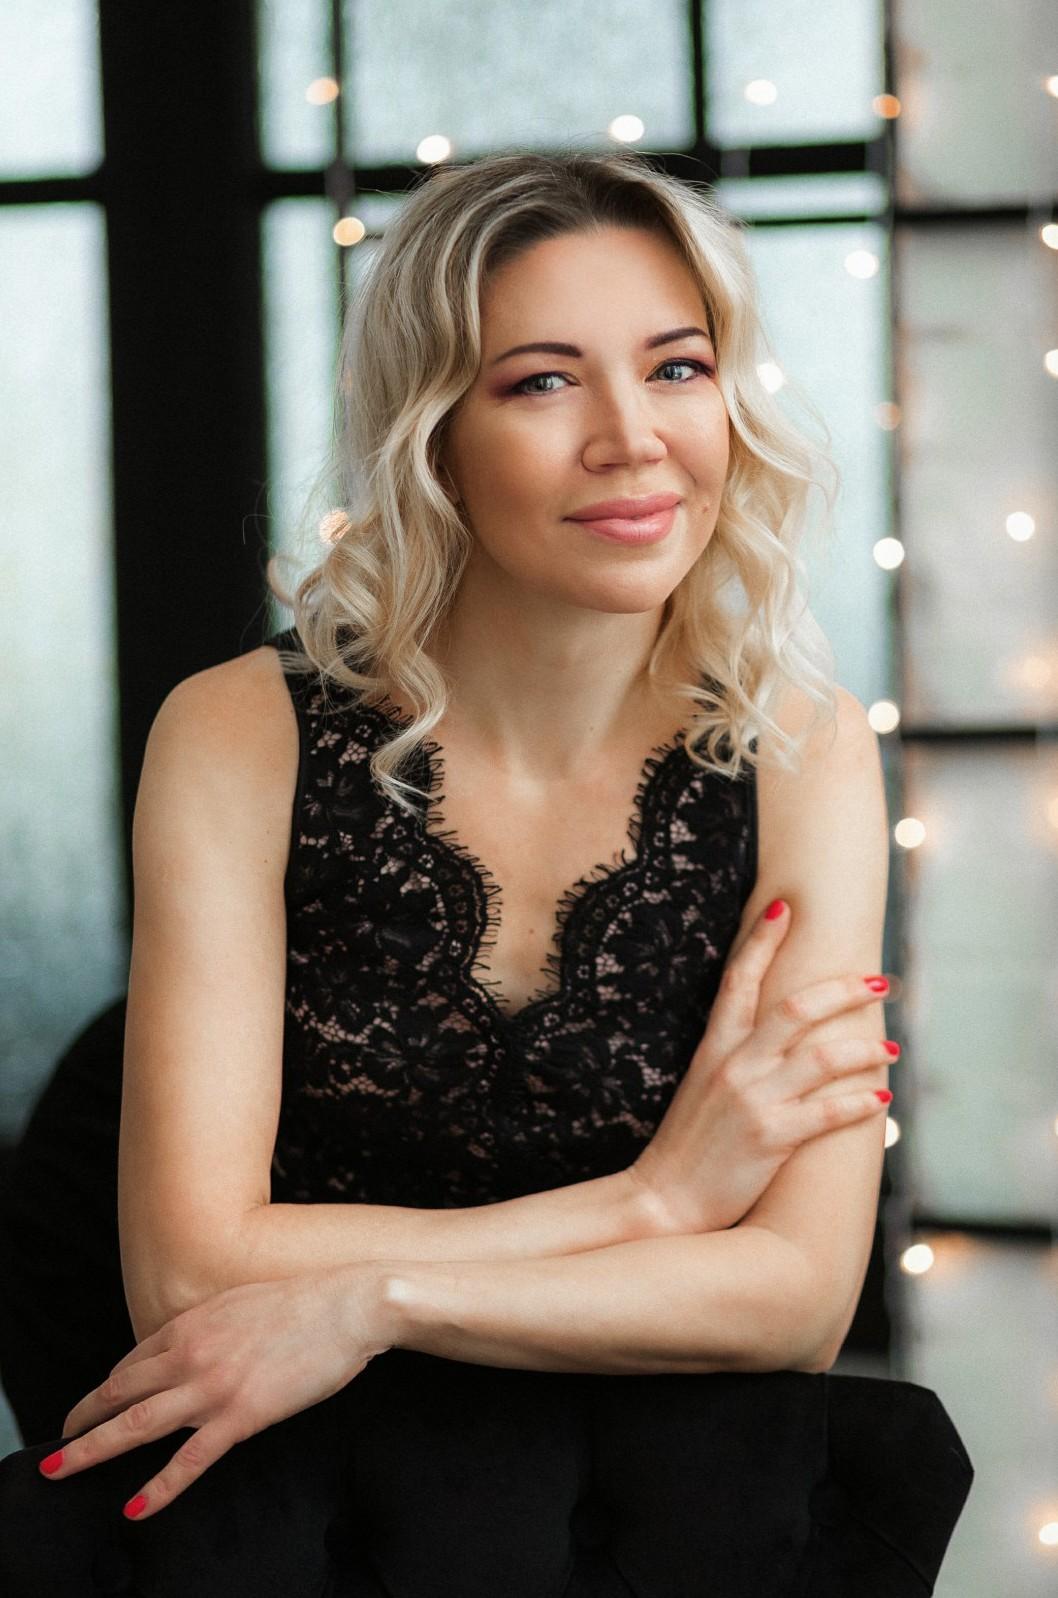 Agence matrimoniale rencontre de Elena  femme célibataire de 44 ans, Schiltigheim.